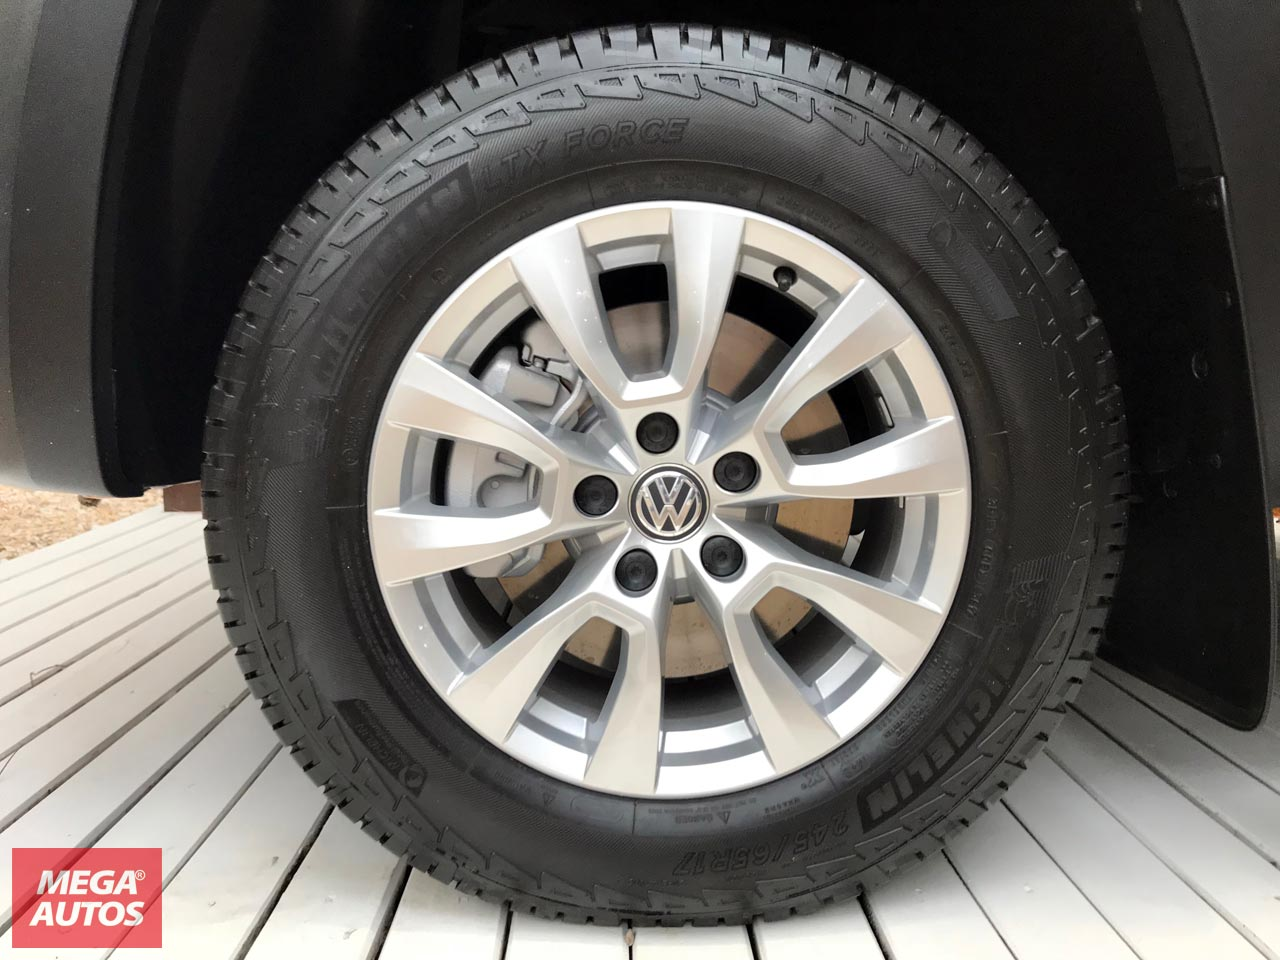 Llantas Volkswagen Amarok V6 Comfortline